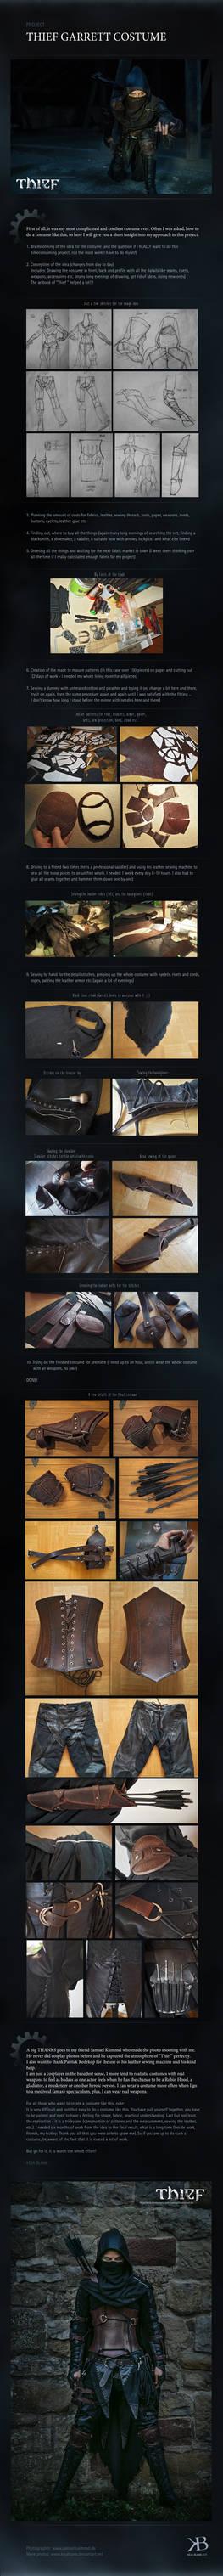 Thief 4 - Costume Process Tutorial